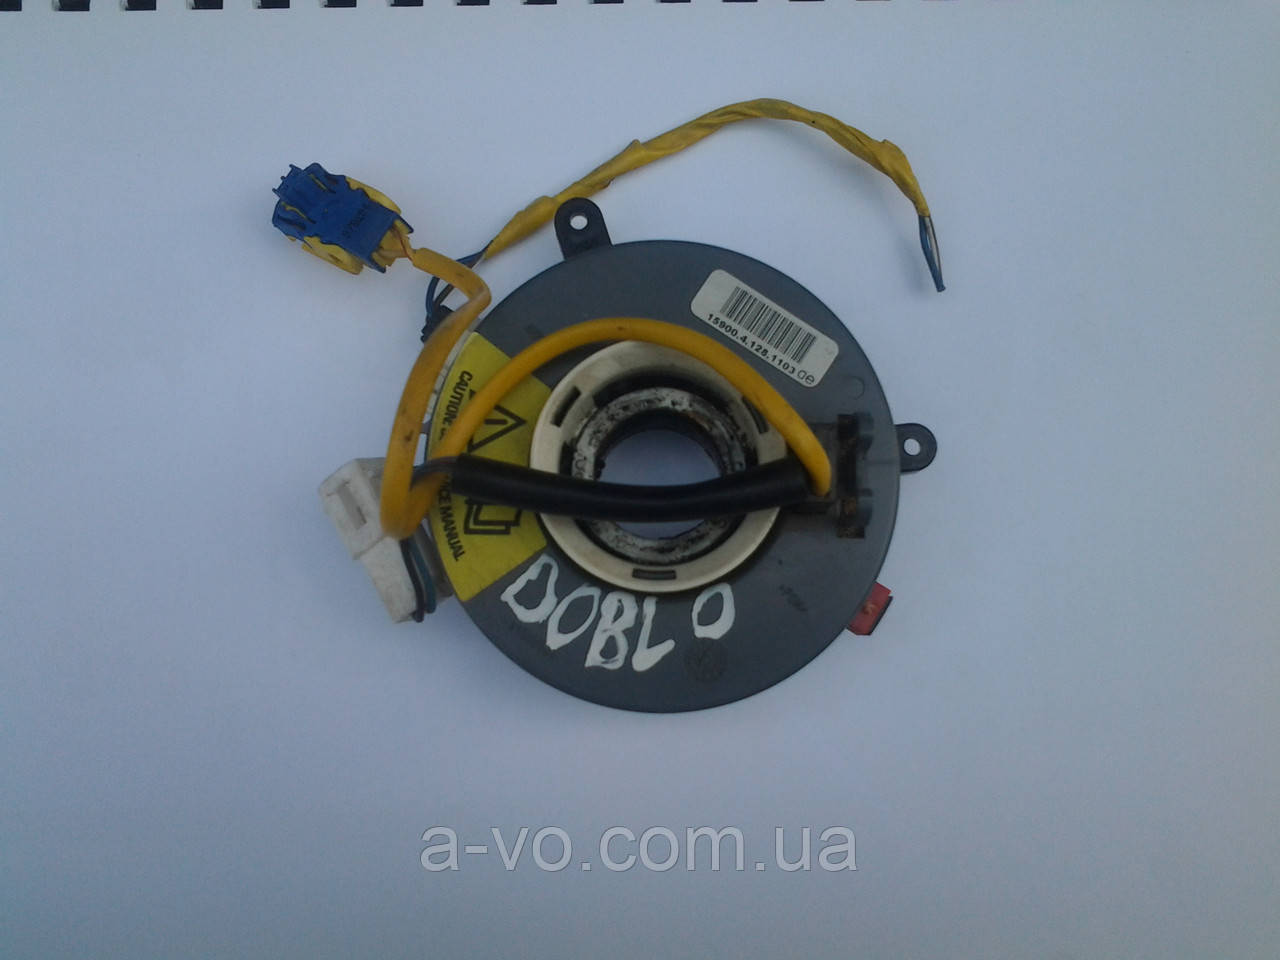 Шлейф AIRBAG кольцо подрулевое Fiat Doblo 1592170580724 59001044 00400089 00400088